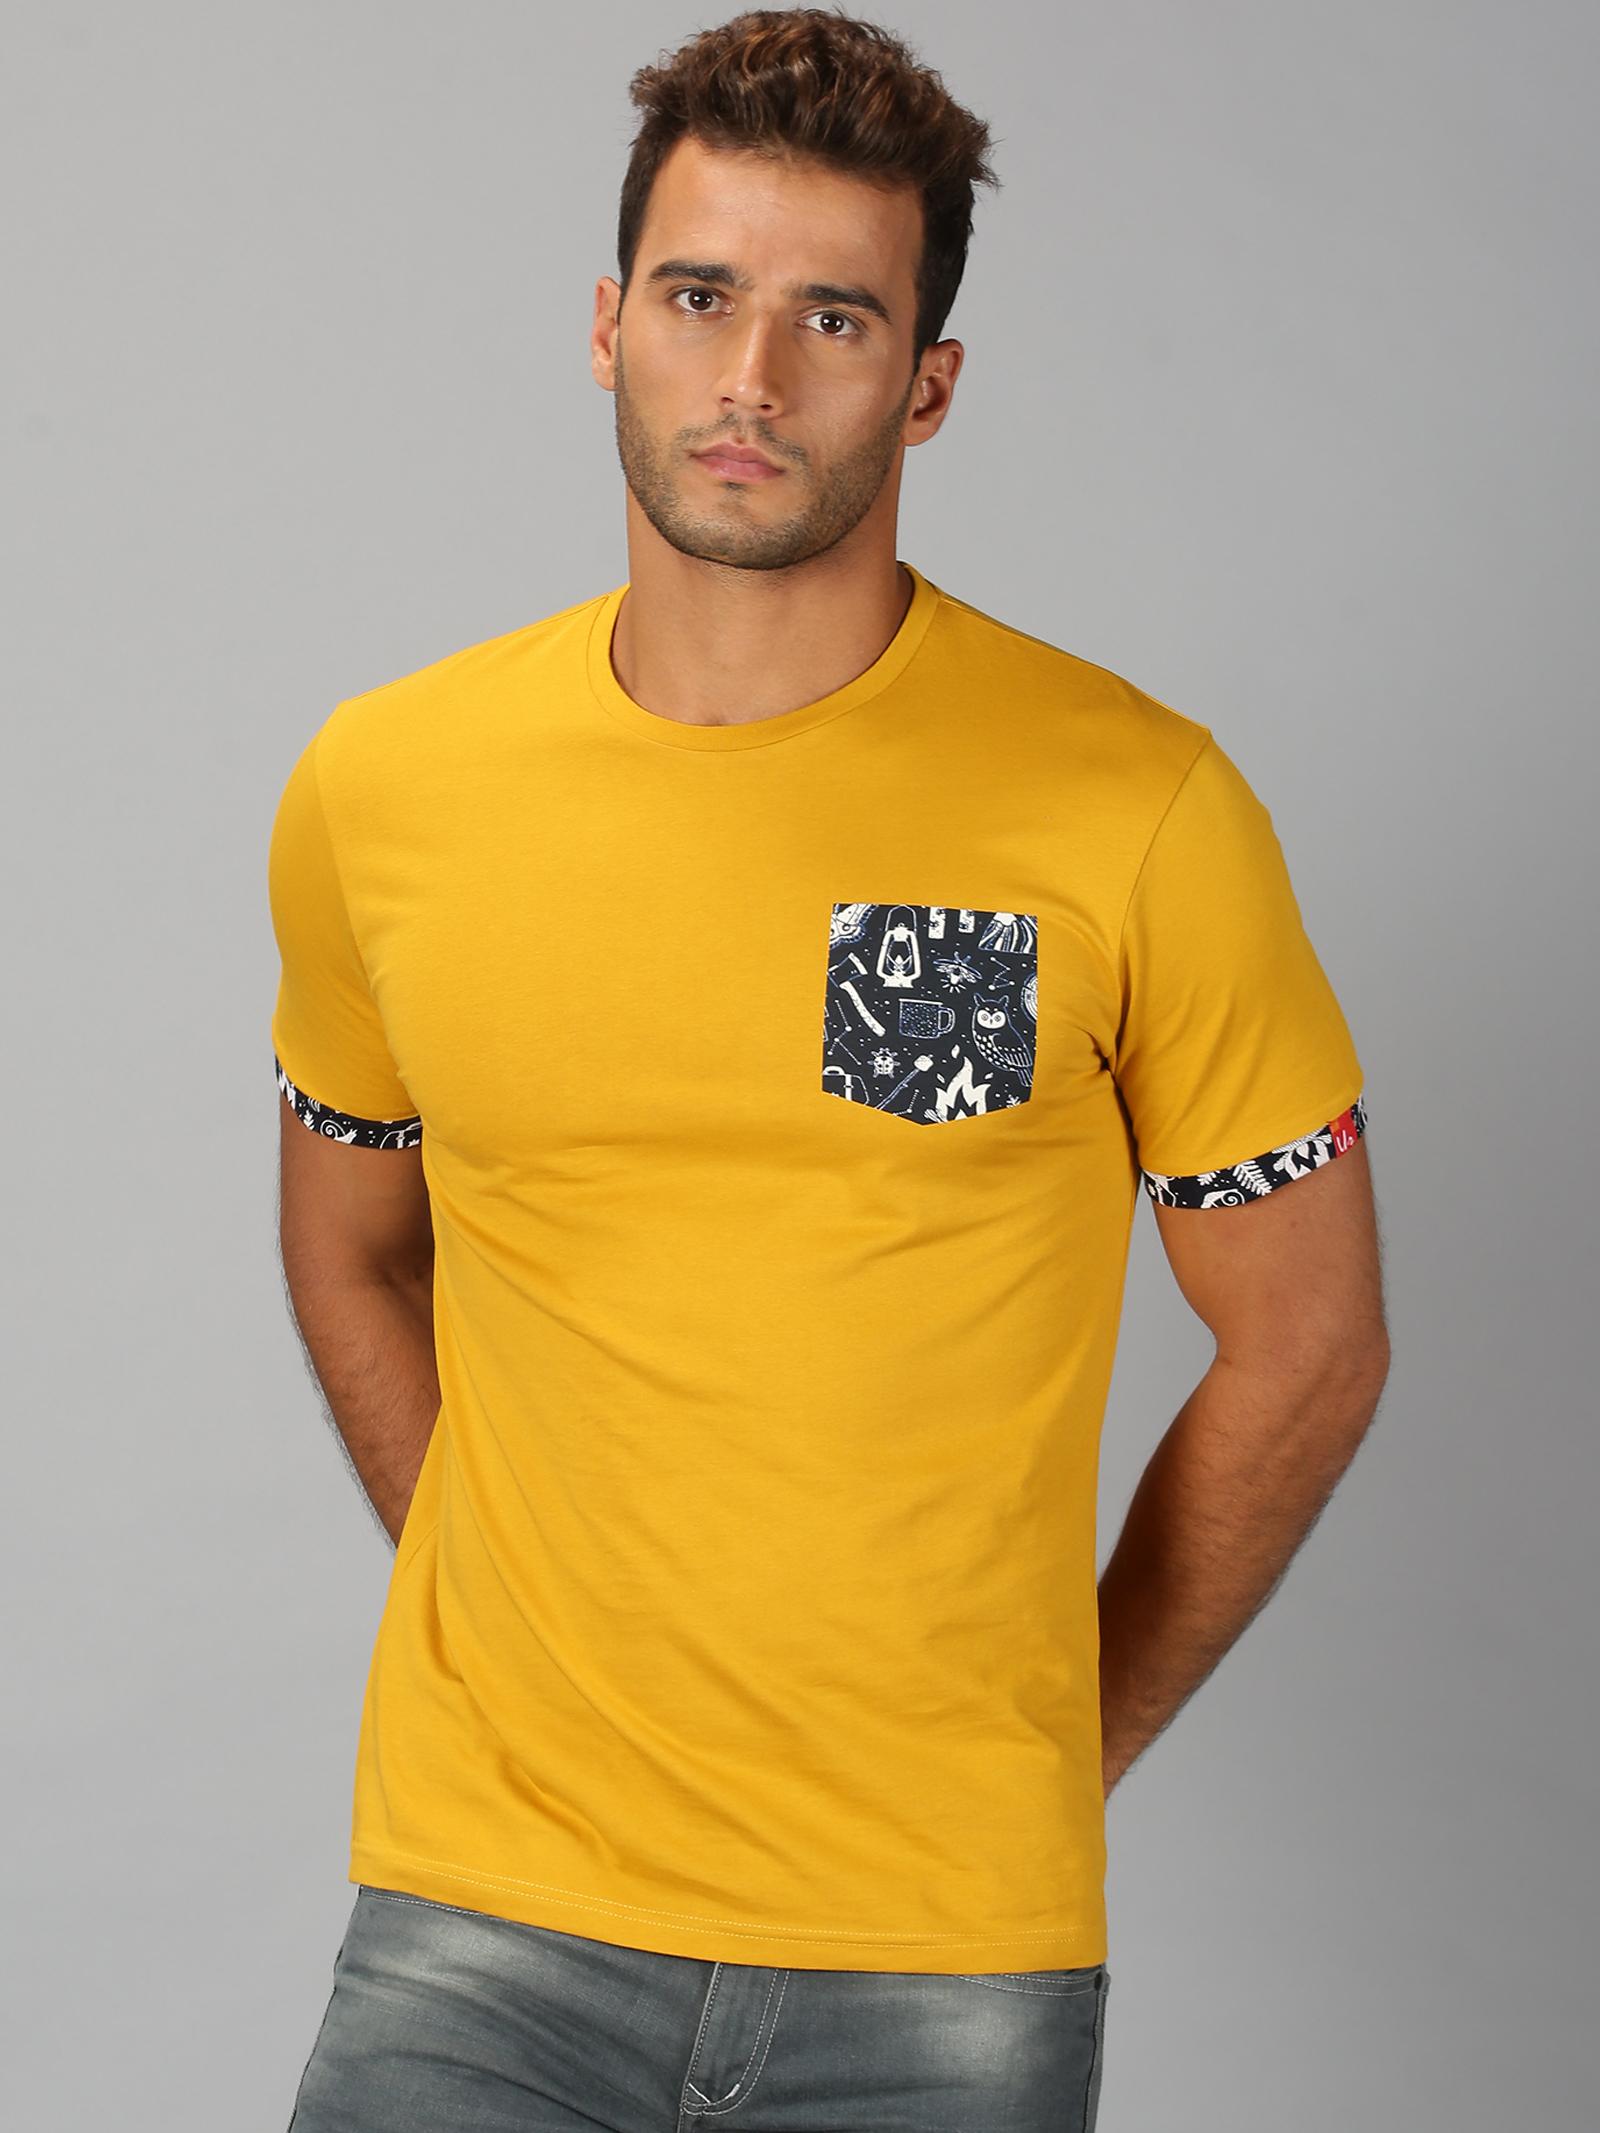 UrGear | Mens Round Neck Printed Mustard T-Shirt